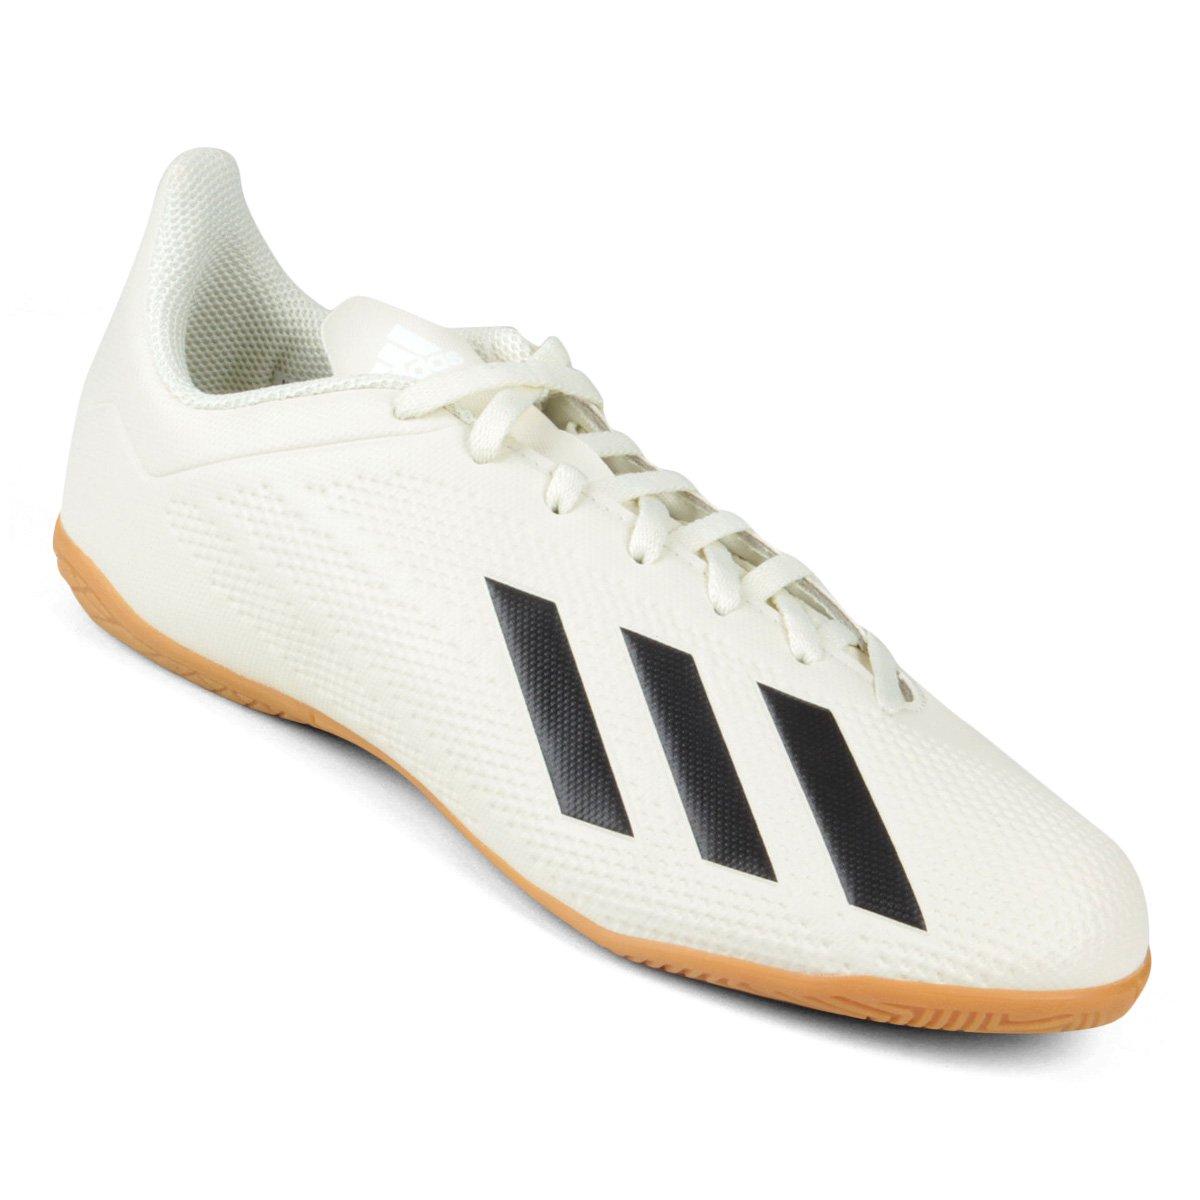 Chuteira Futsal Adidas X Tango 18 4 IN Masculina cebef7dff75eb